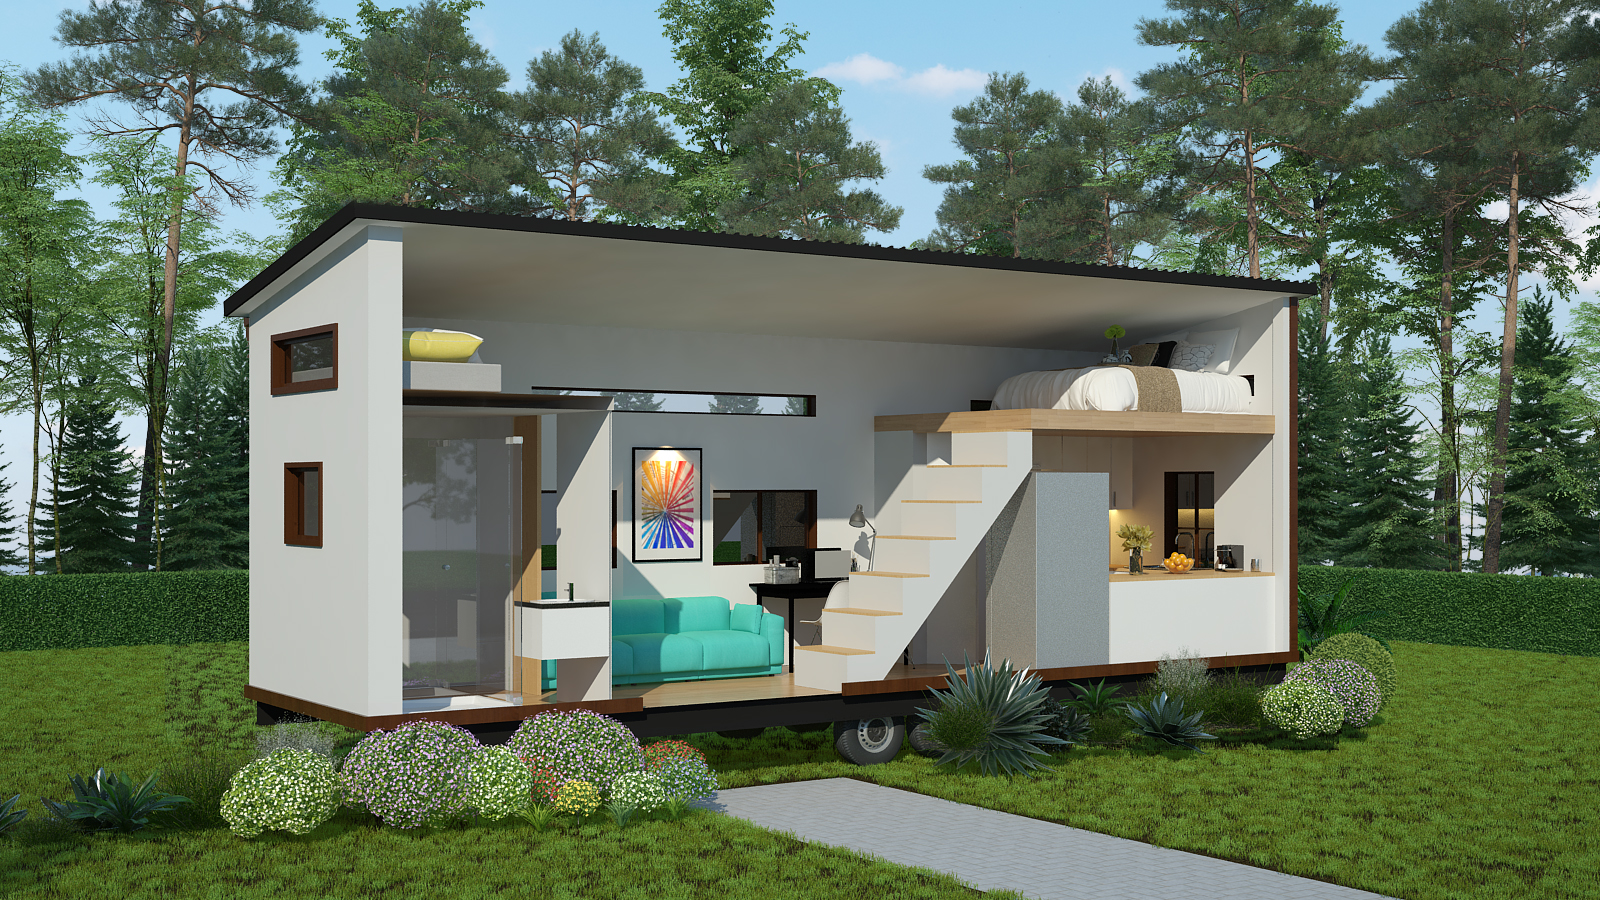 Tiny home cut-away view to show custom interior